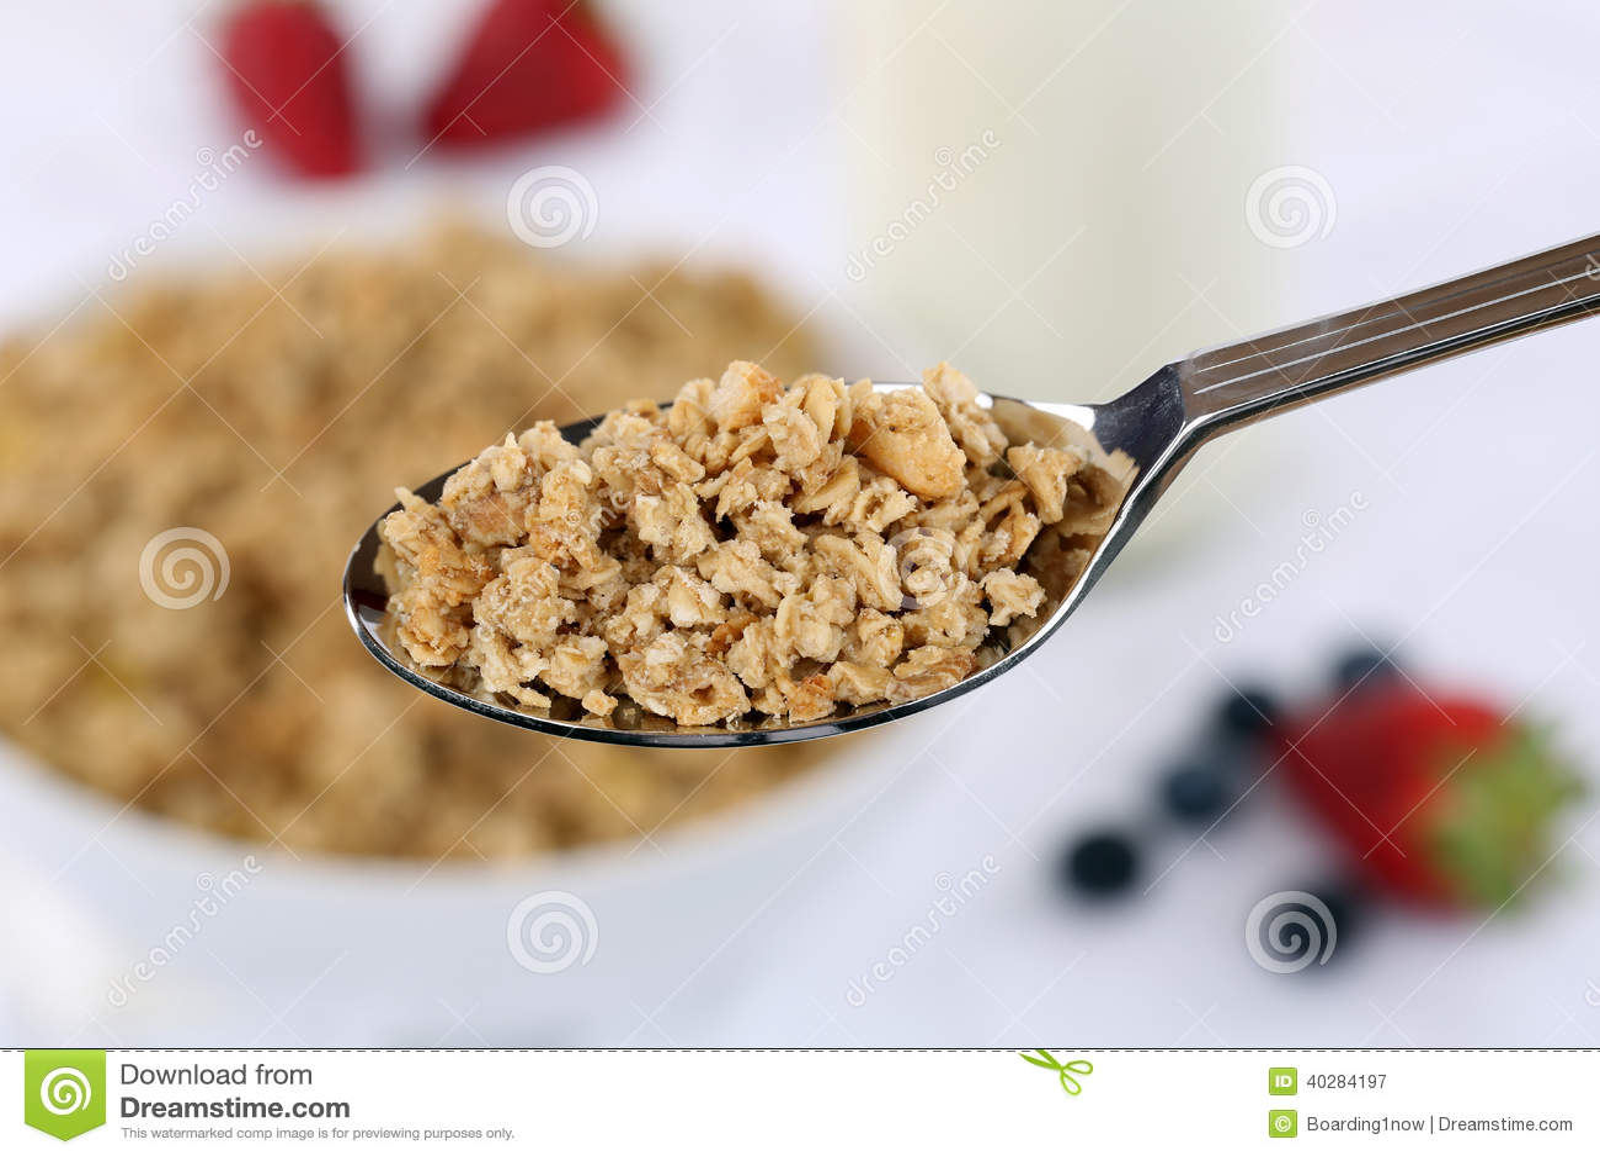 Хлопья на ложке для завтрака